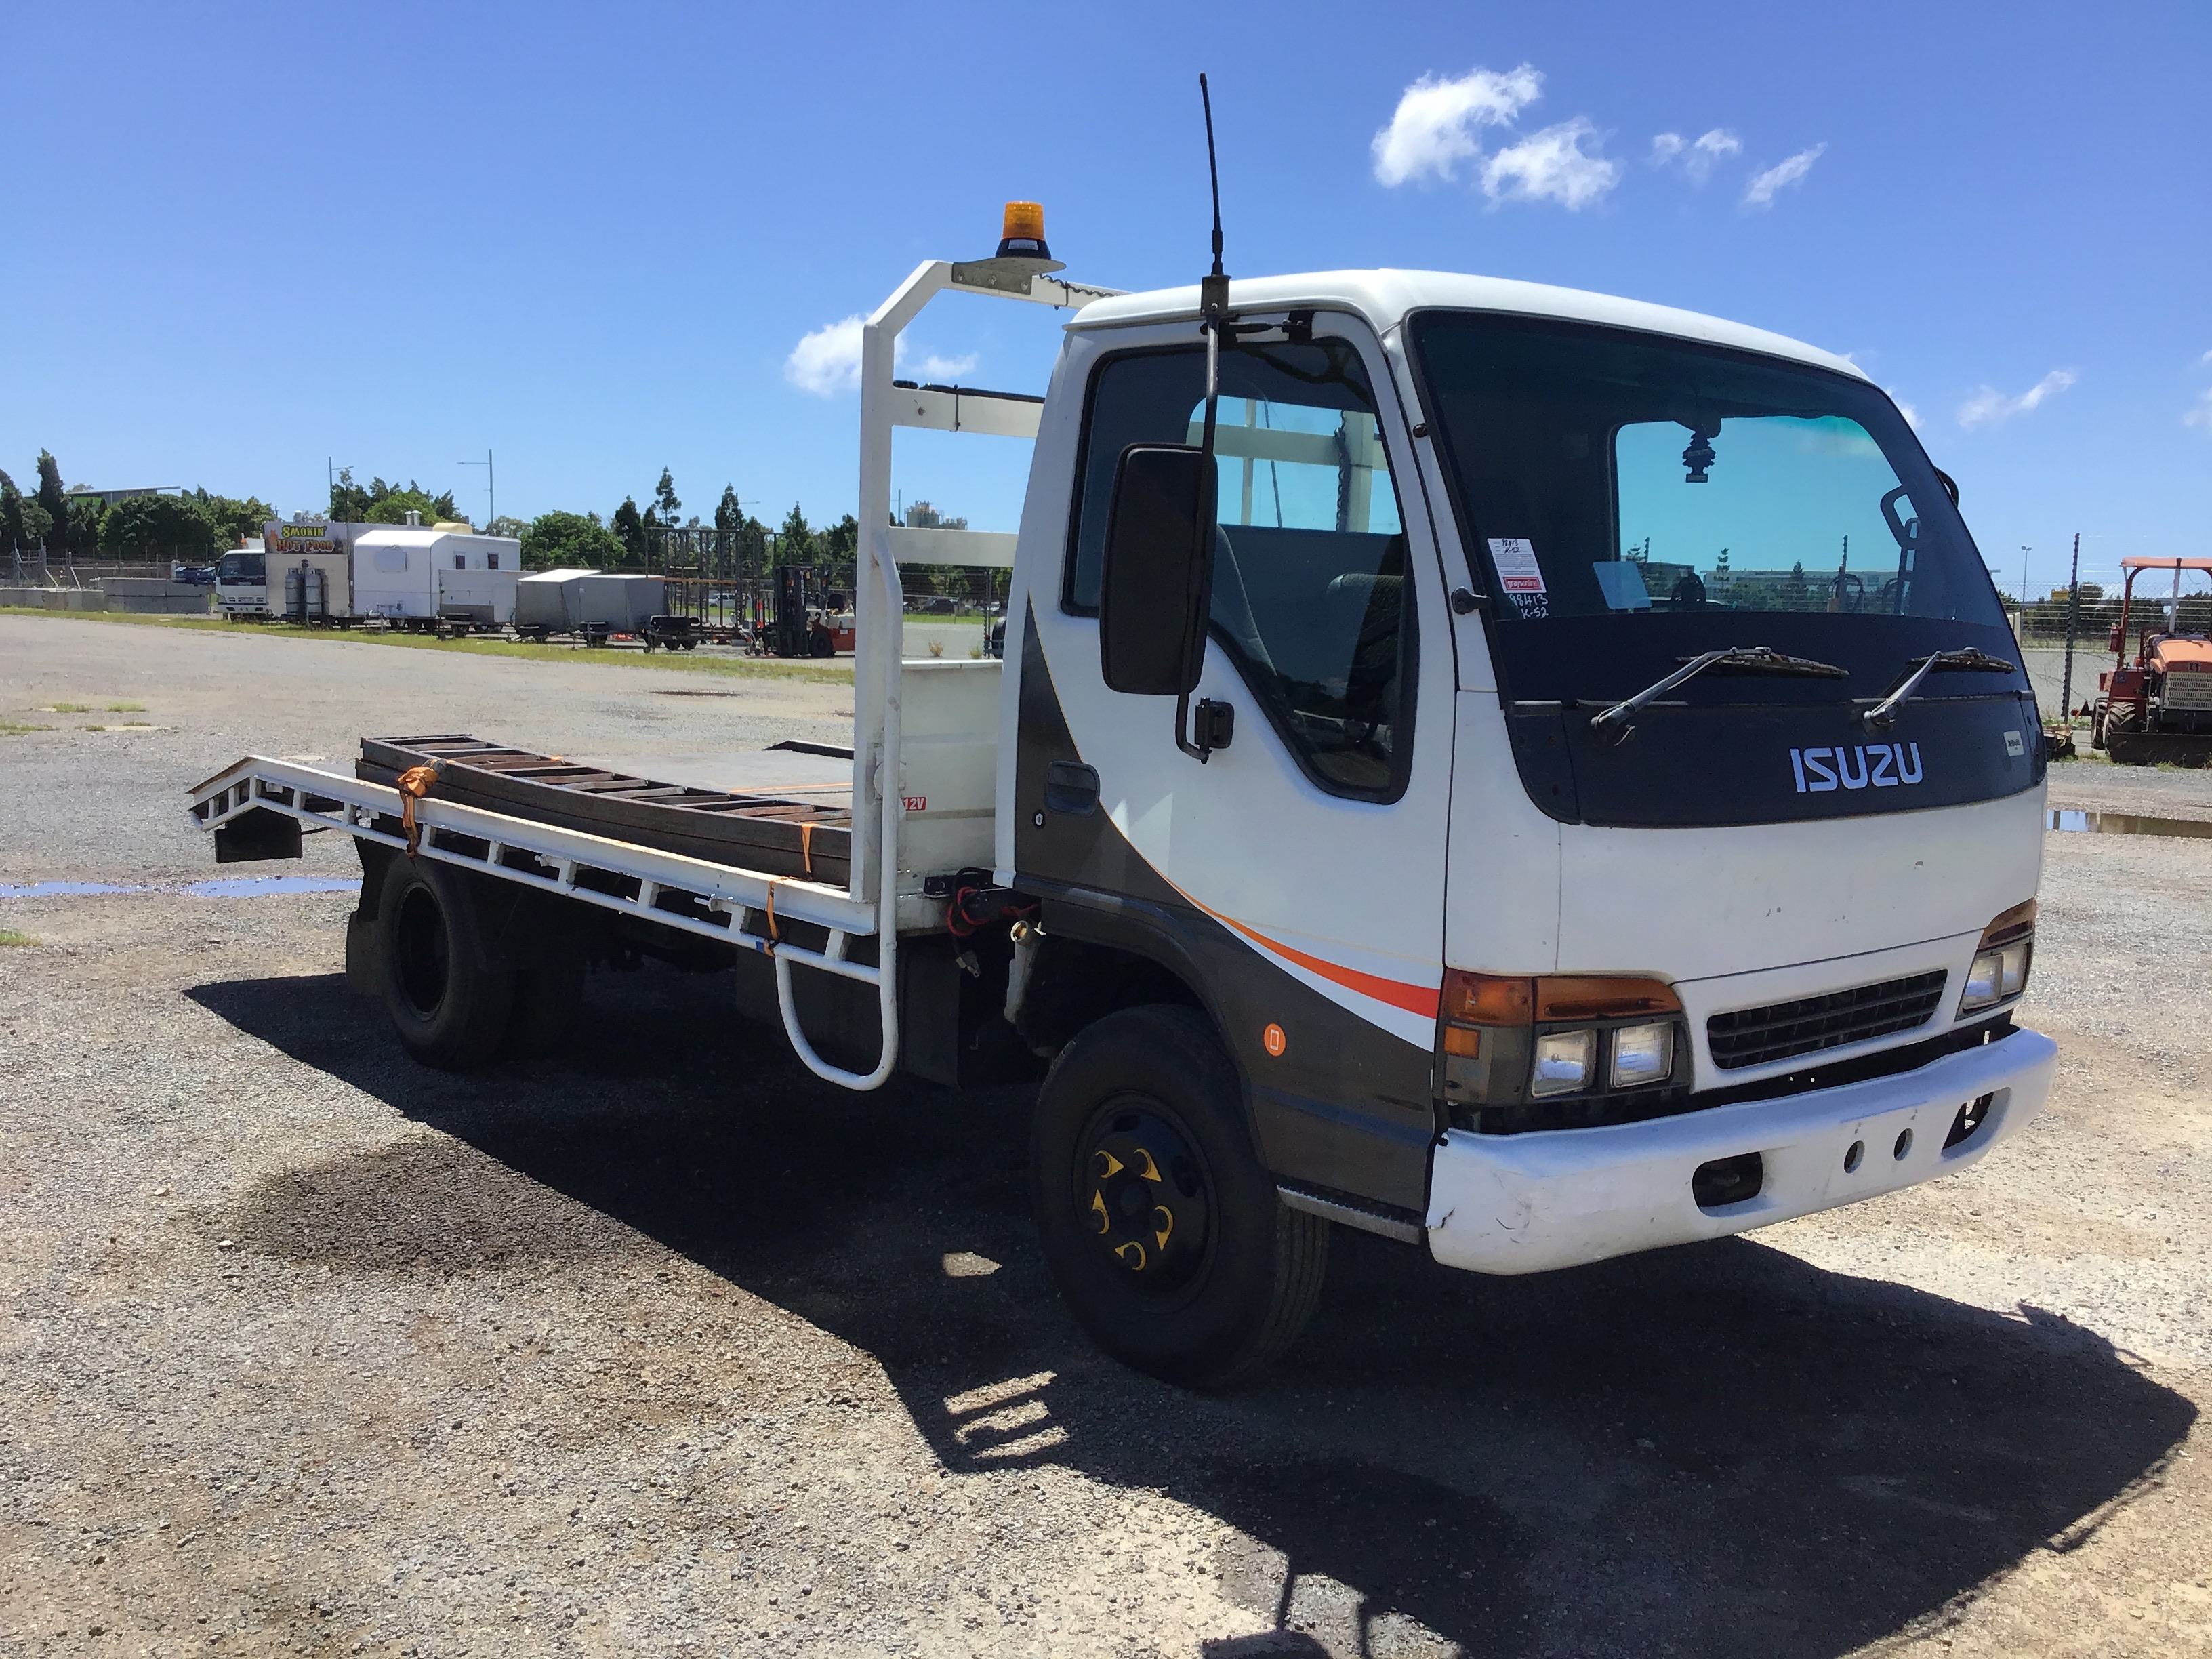 1998 Isuzu NPR200 4 x 2 Beavertail Truck